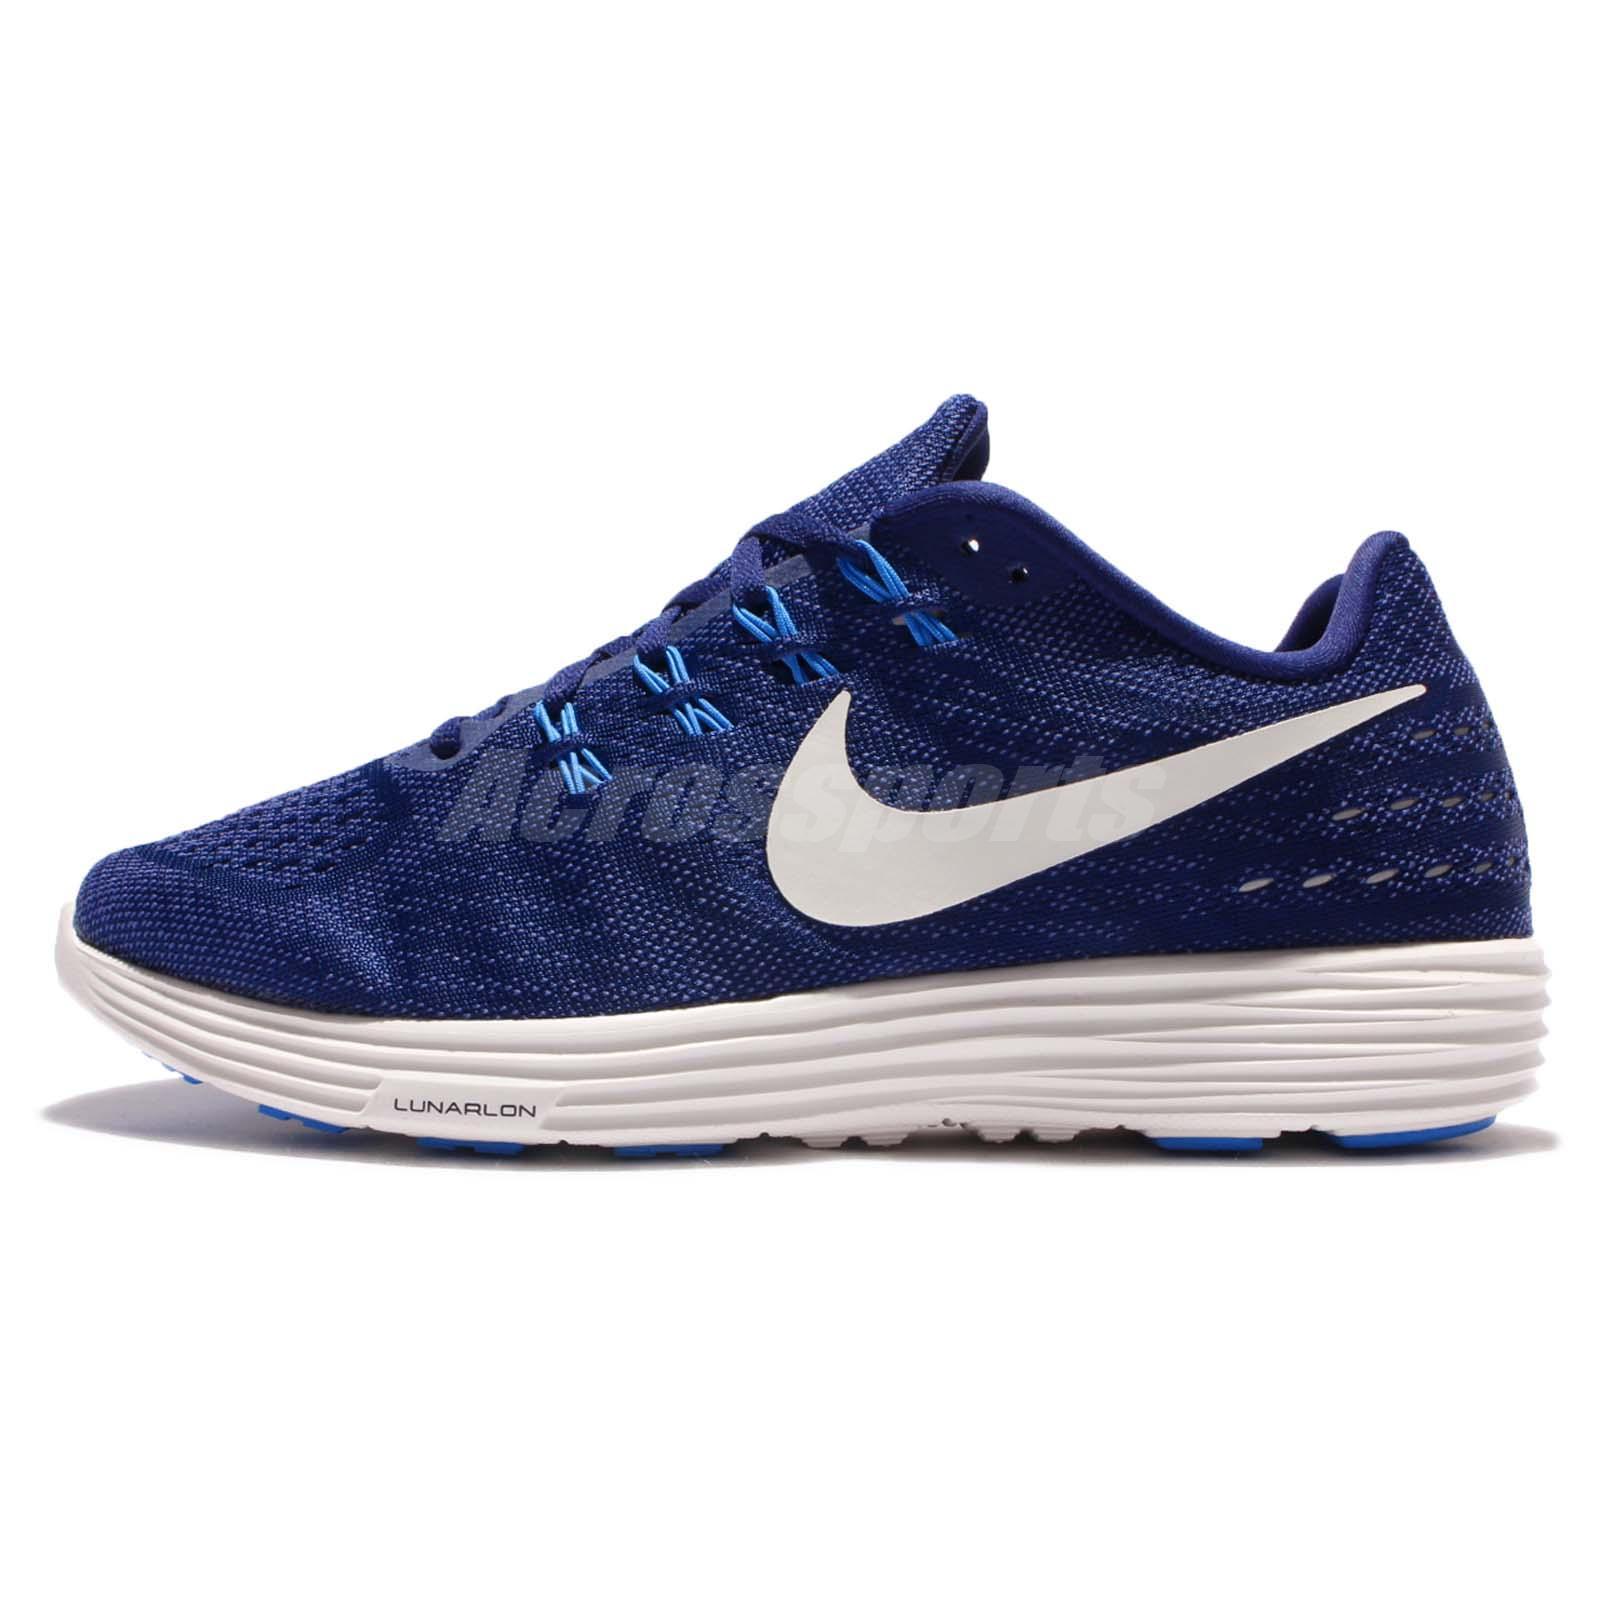 Lunarlon Nike Shoes Ebay